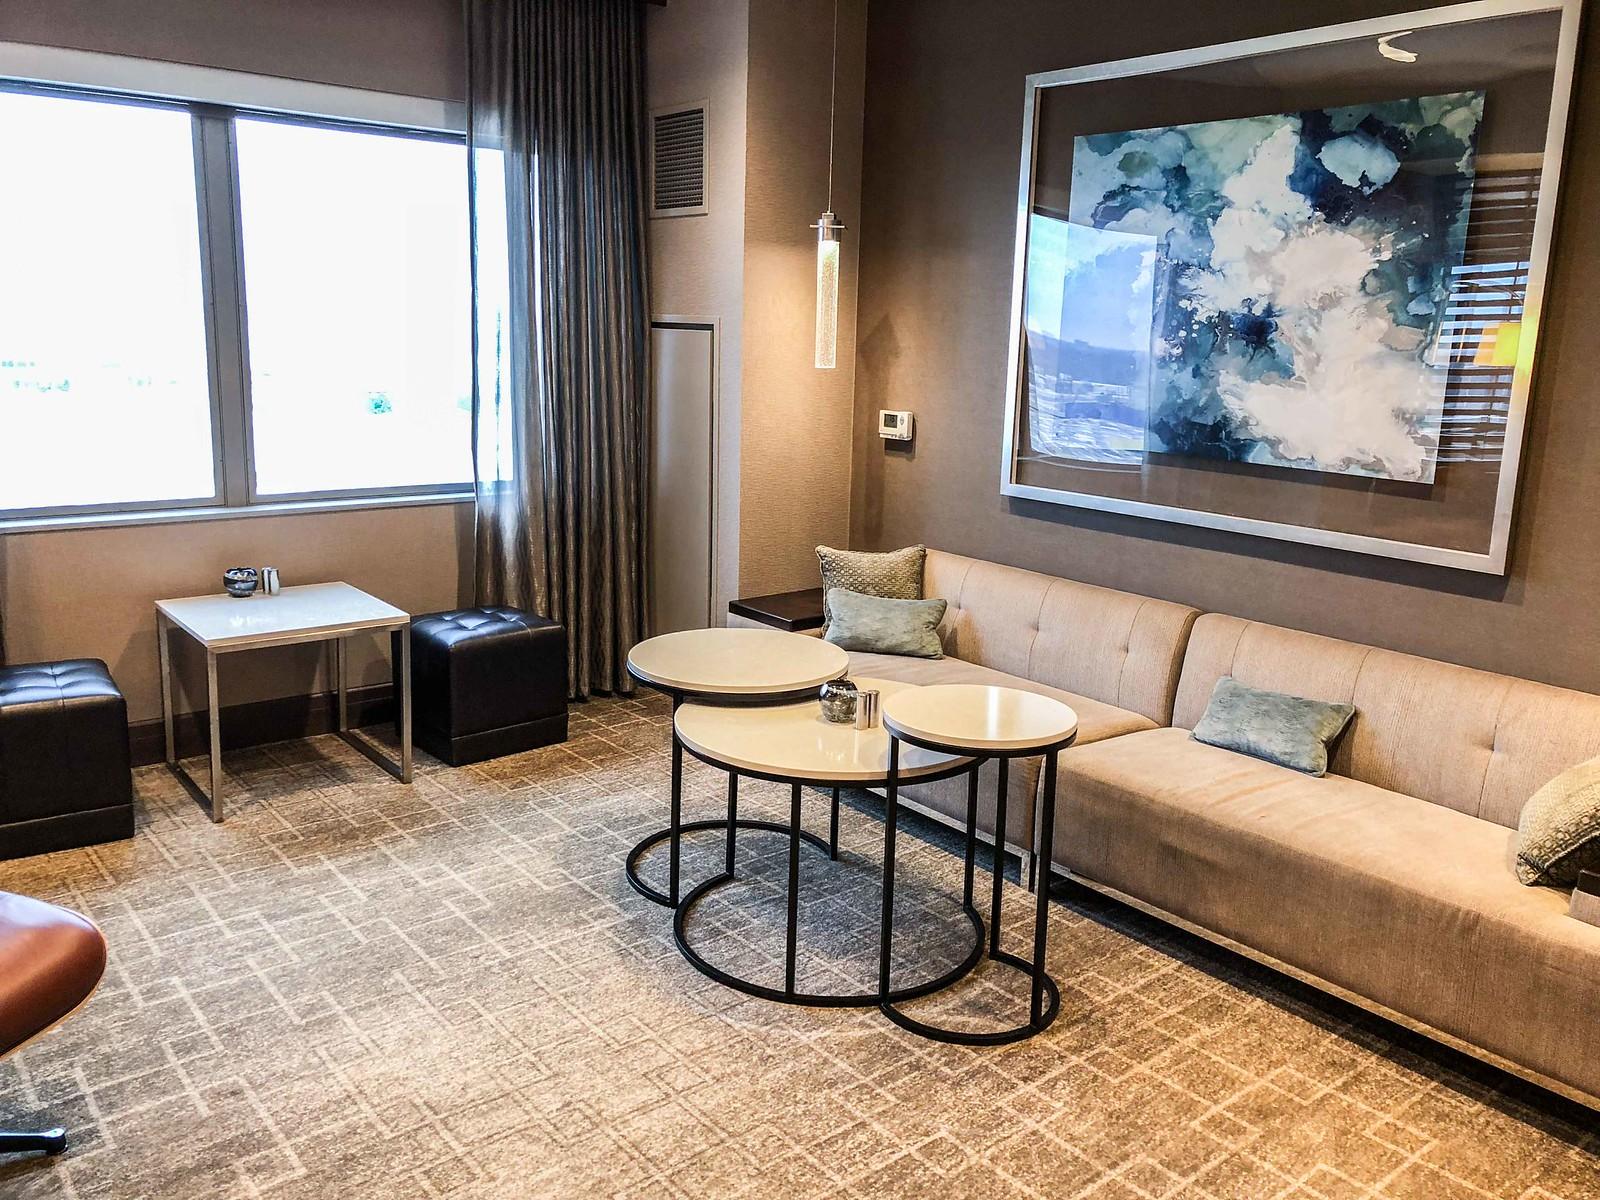 executive lounge in JW Marriott Minneapolis